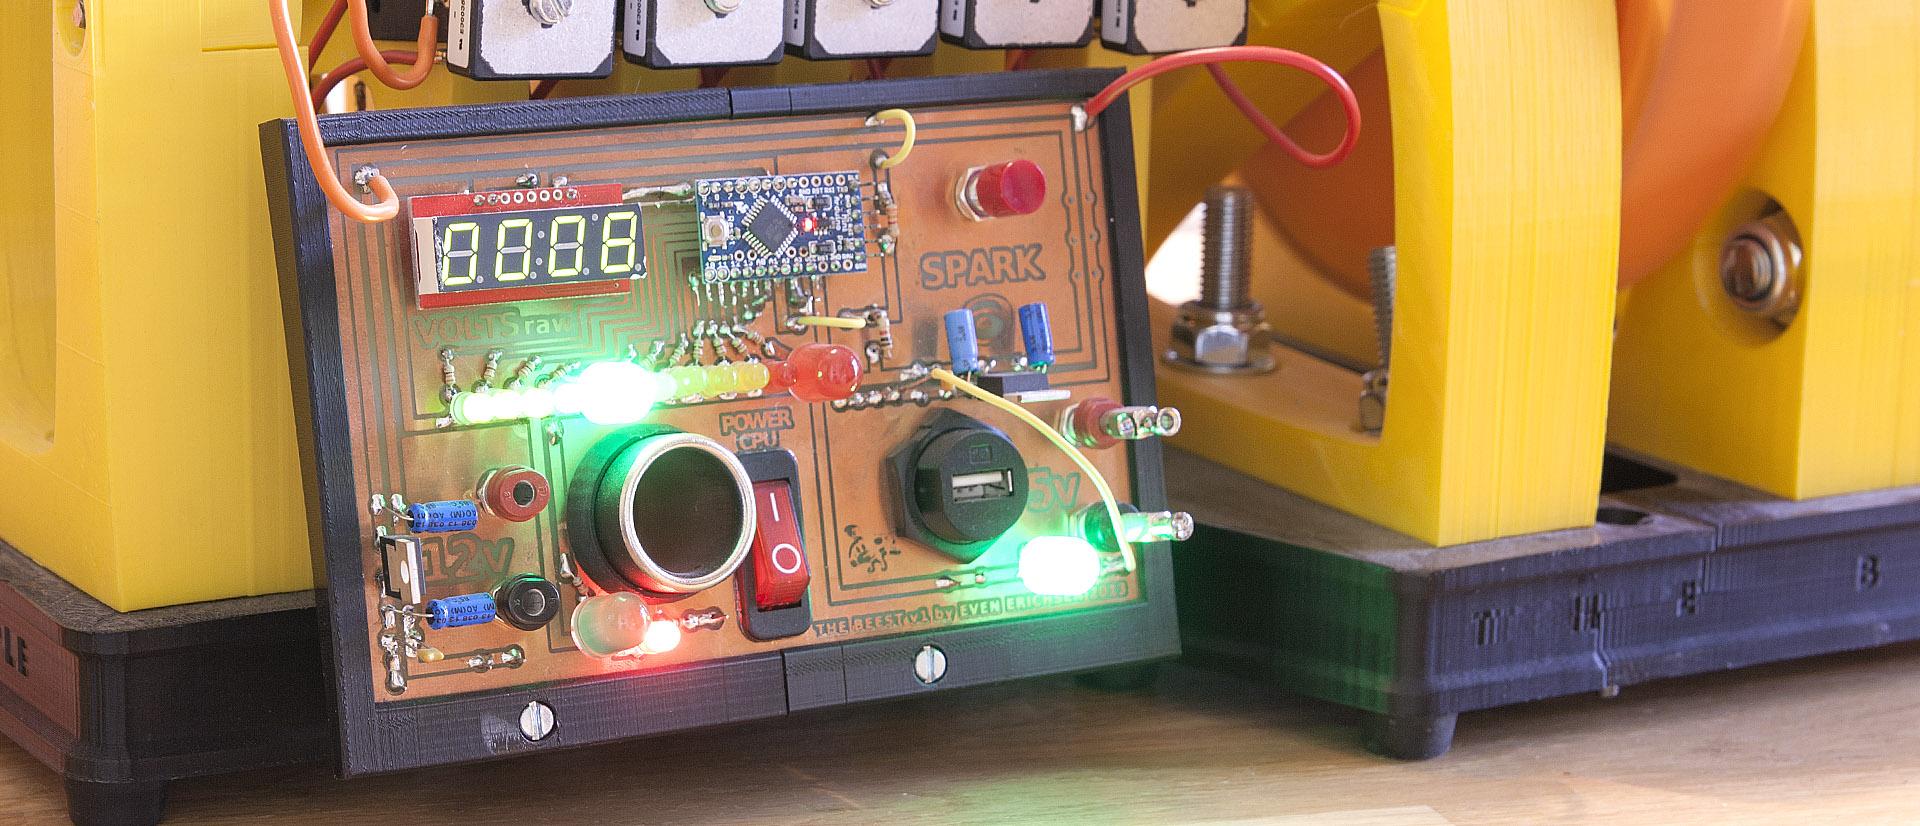 Justpressprint 3d printed Power Generator The Beest PCB input output control panel